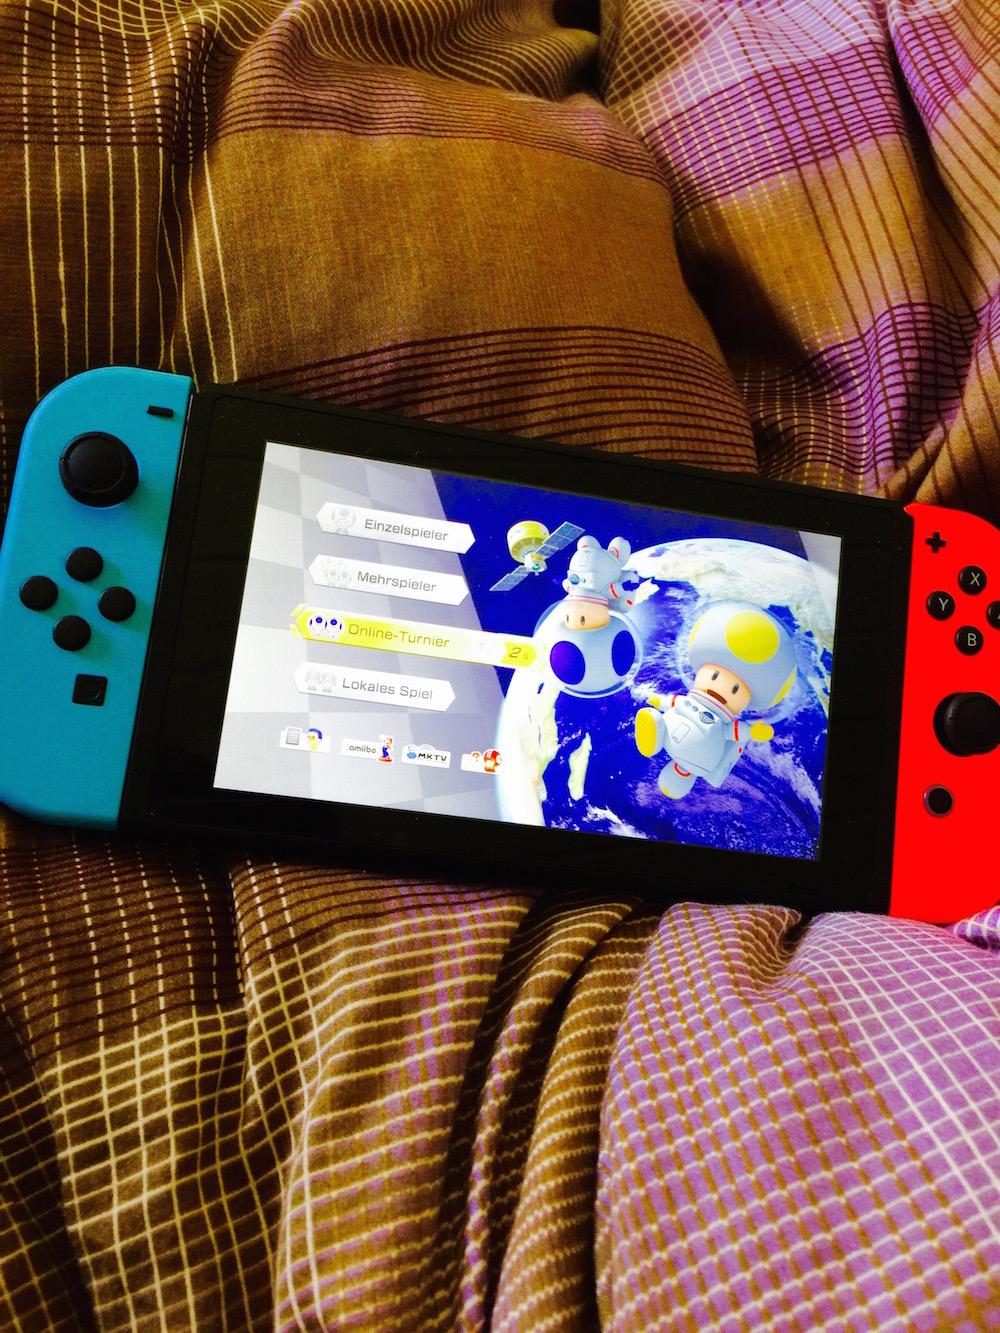 Nintendo Switch: Mario Kart 8 Deluxe im Bett spielen